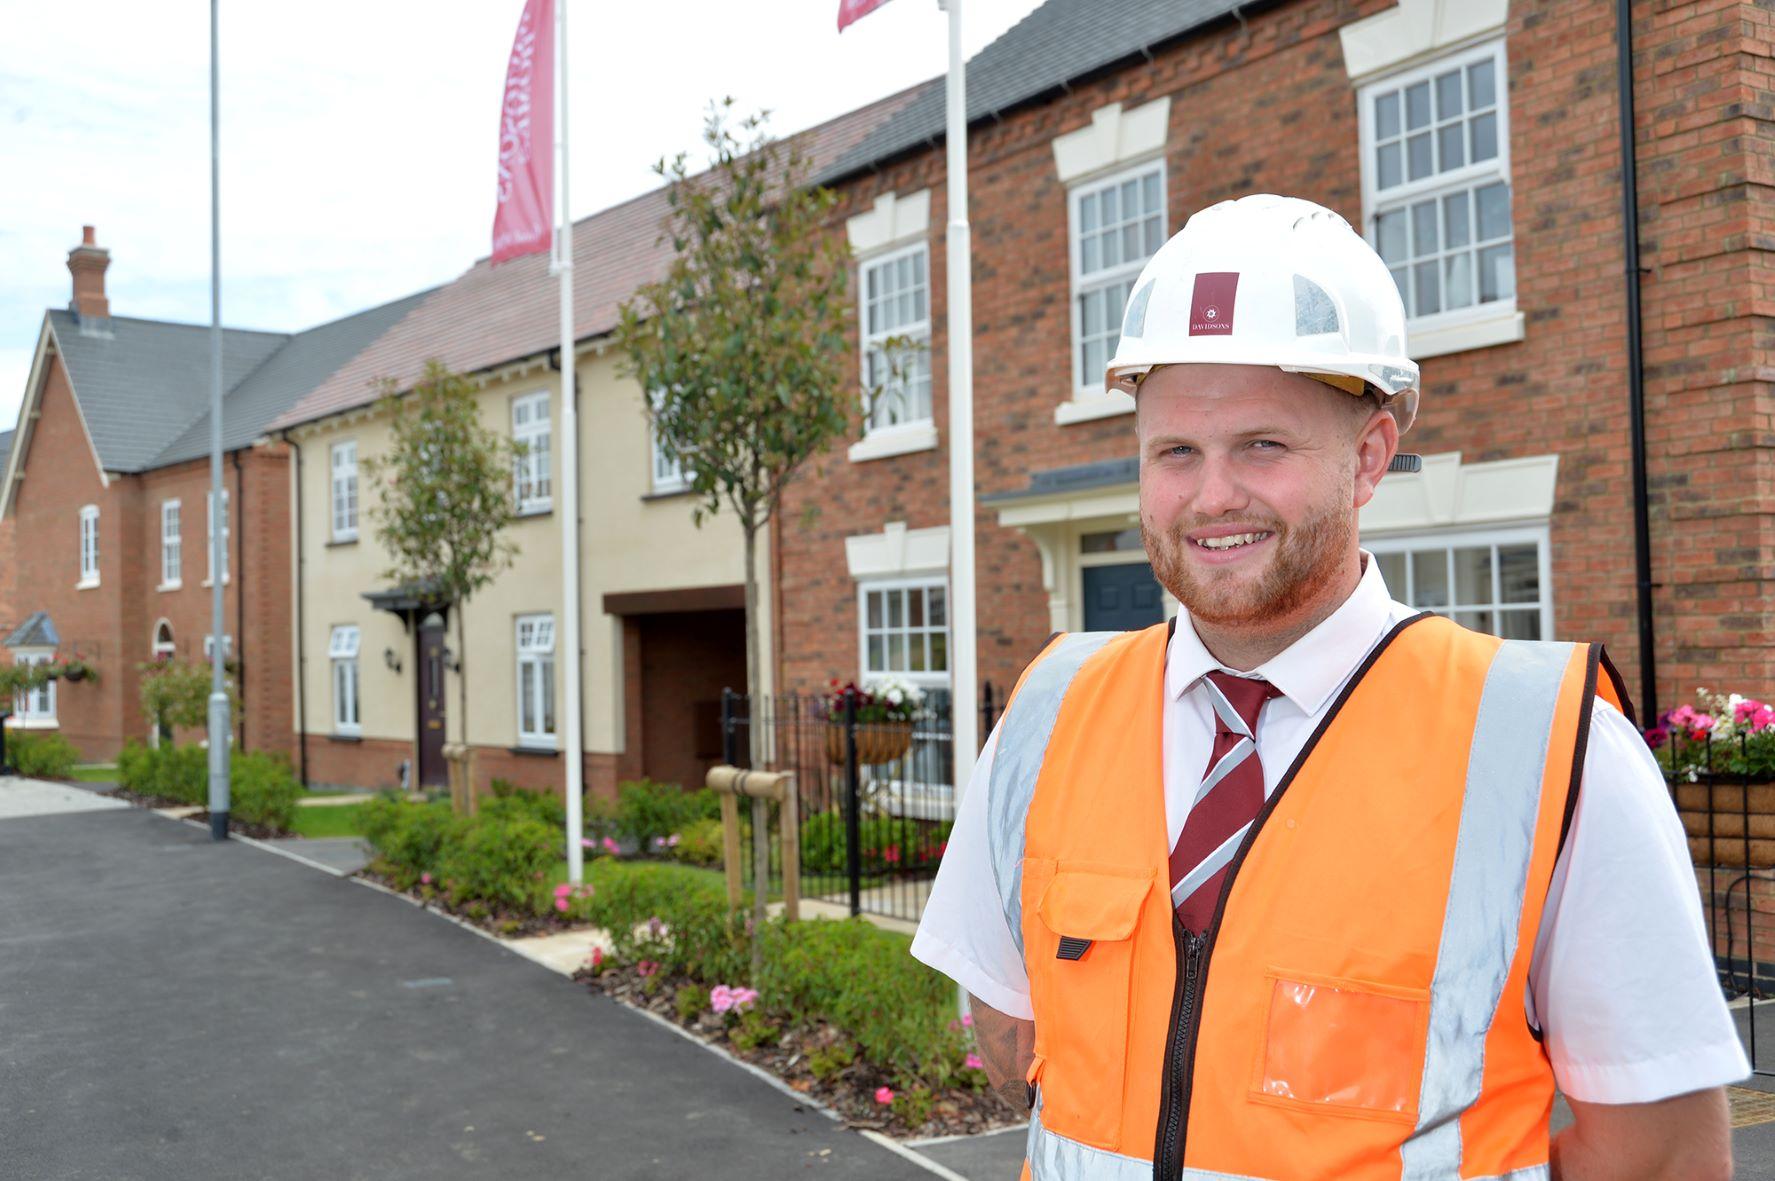 Davidsons Homes employee climbs the career ladder